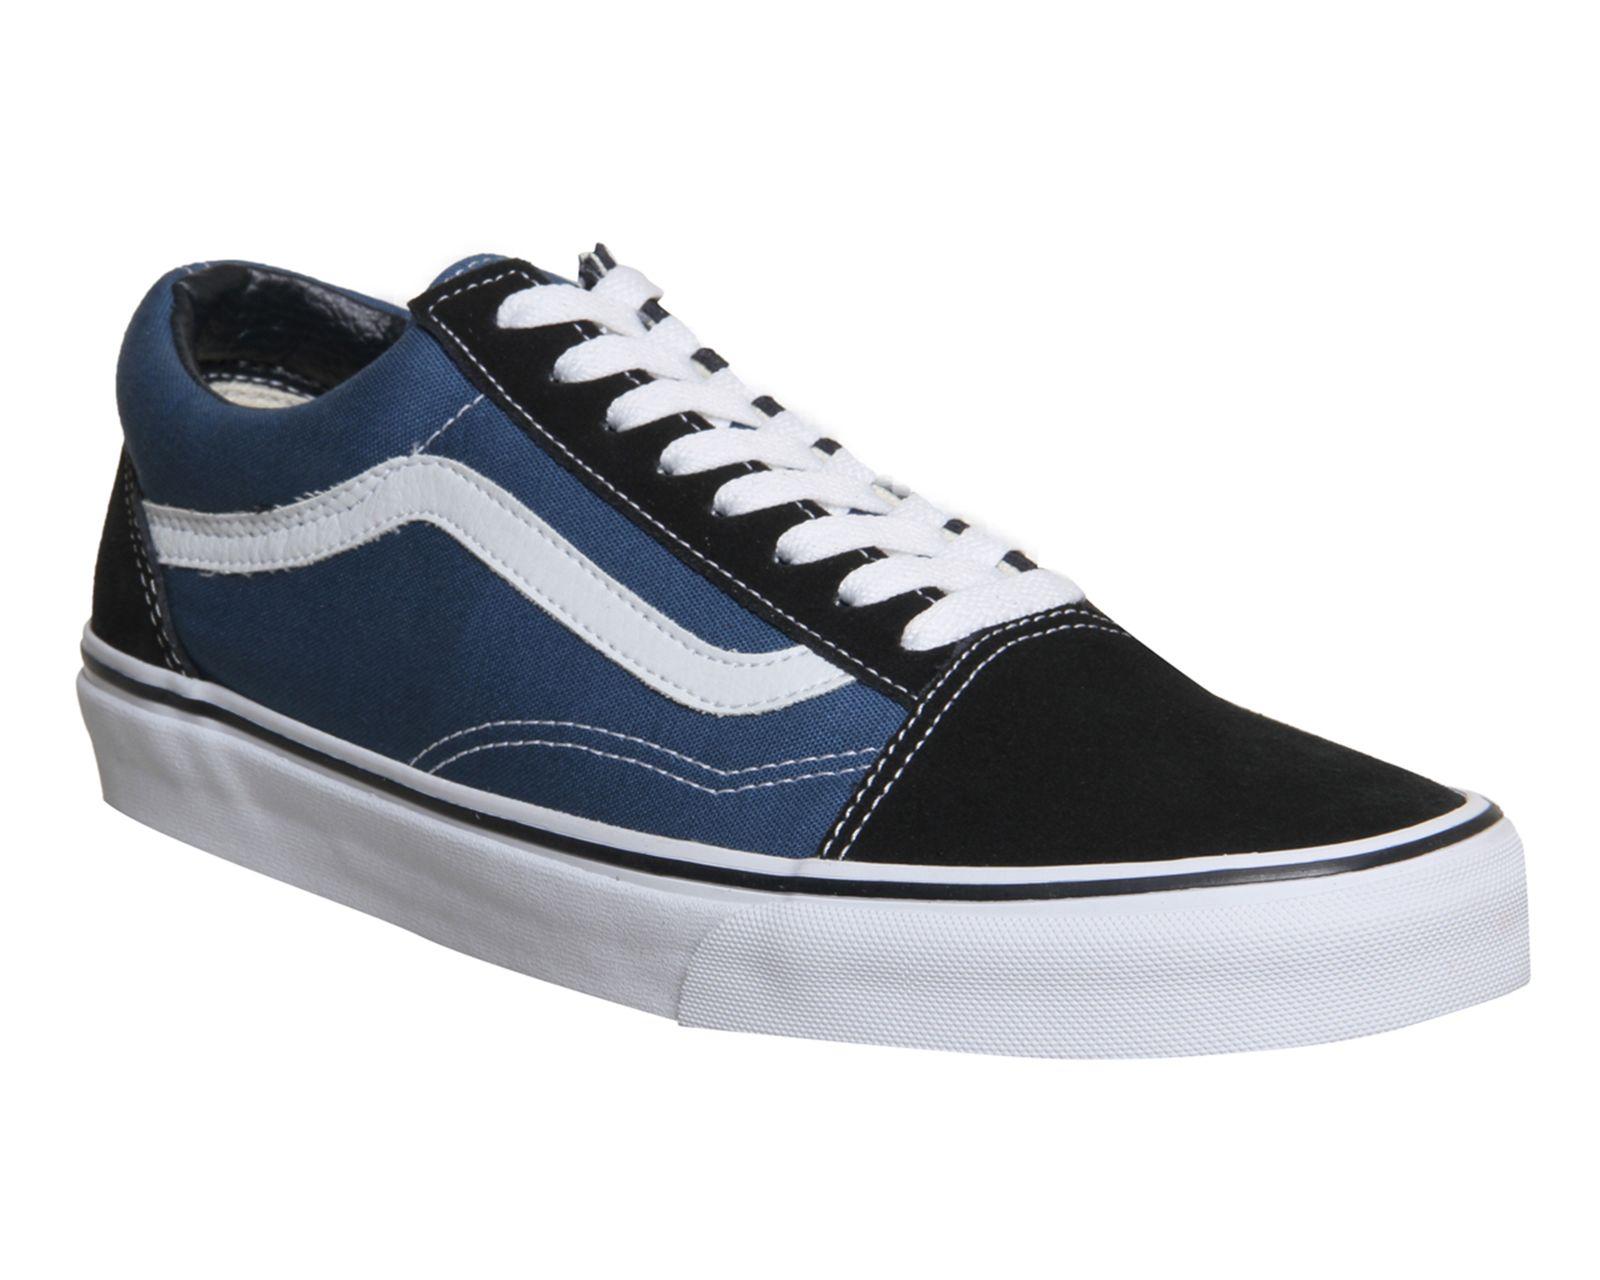 Zapatos Vans JEANS vulcanizado de color azul (36) DfzjW